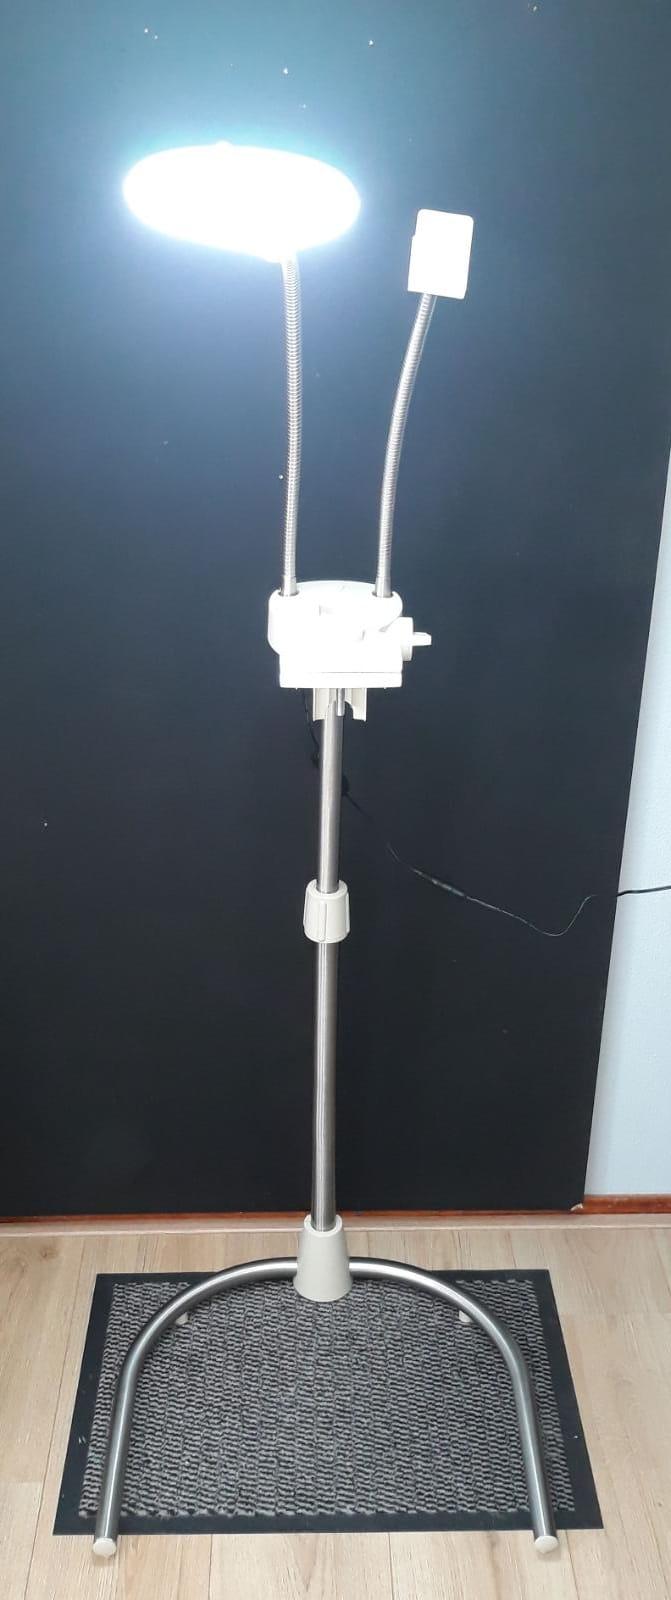 Daylight stitch smart borduur standaard Loeplamp aan